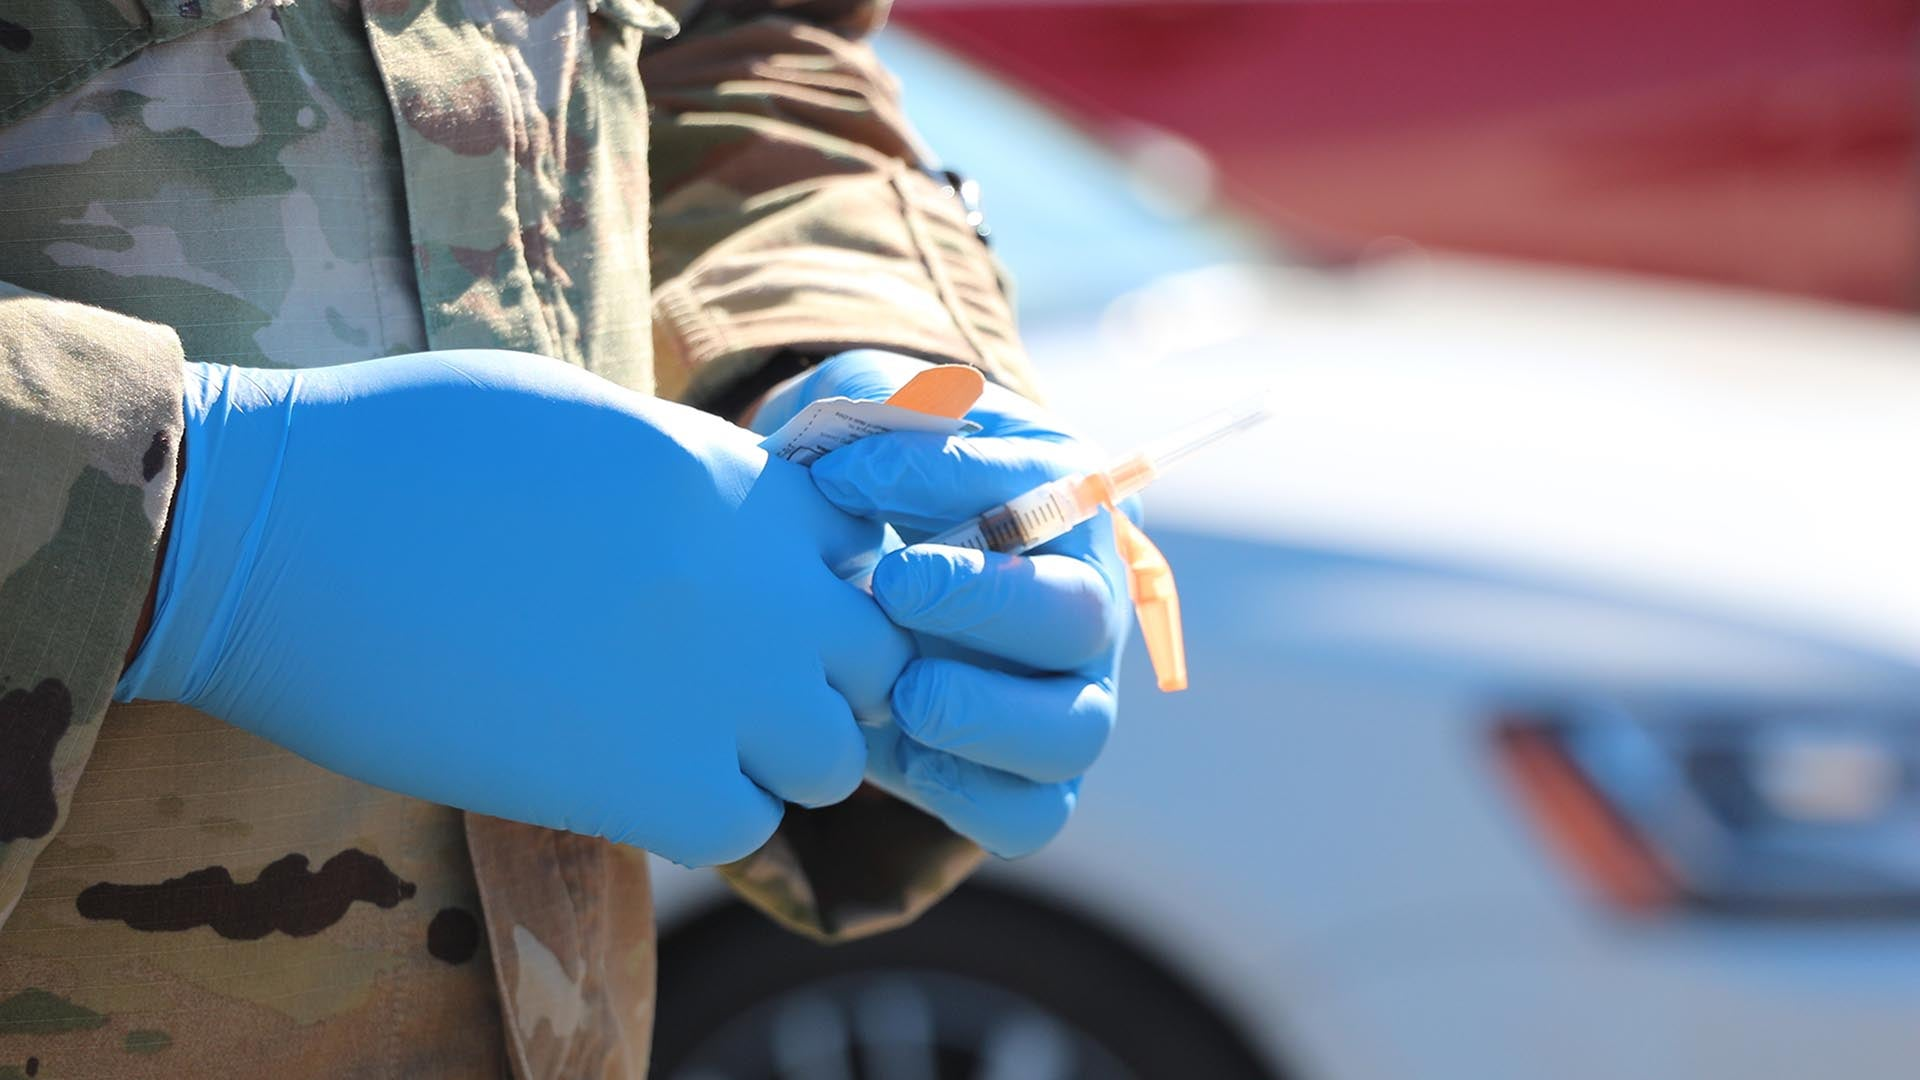 Pentagon considers sending more than 18,000 troops to help vaccinate America